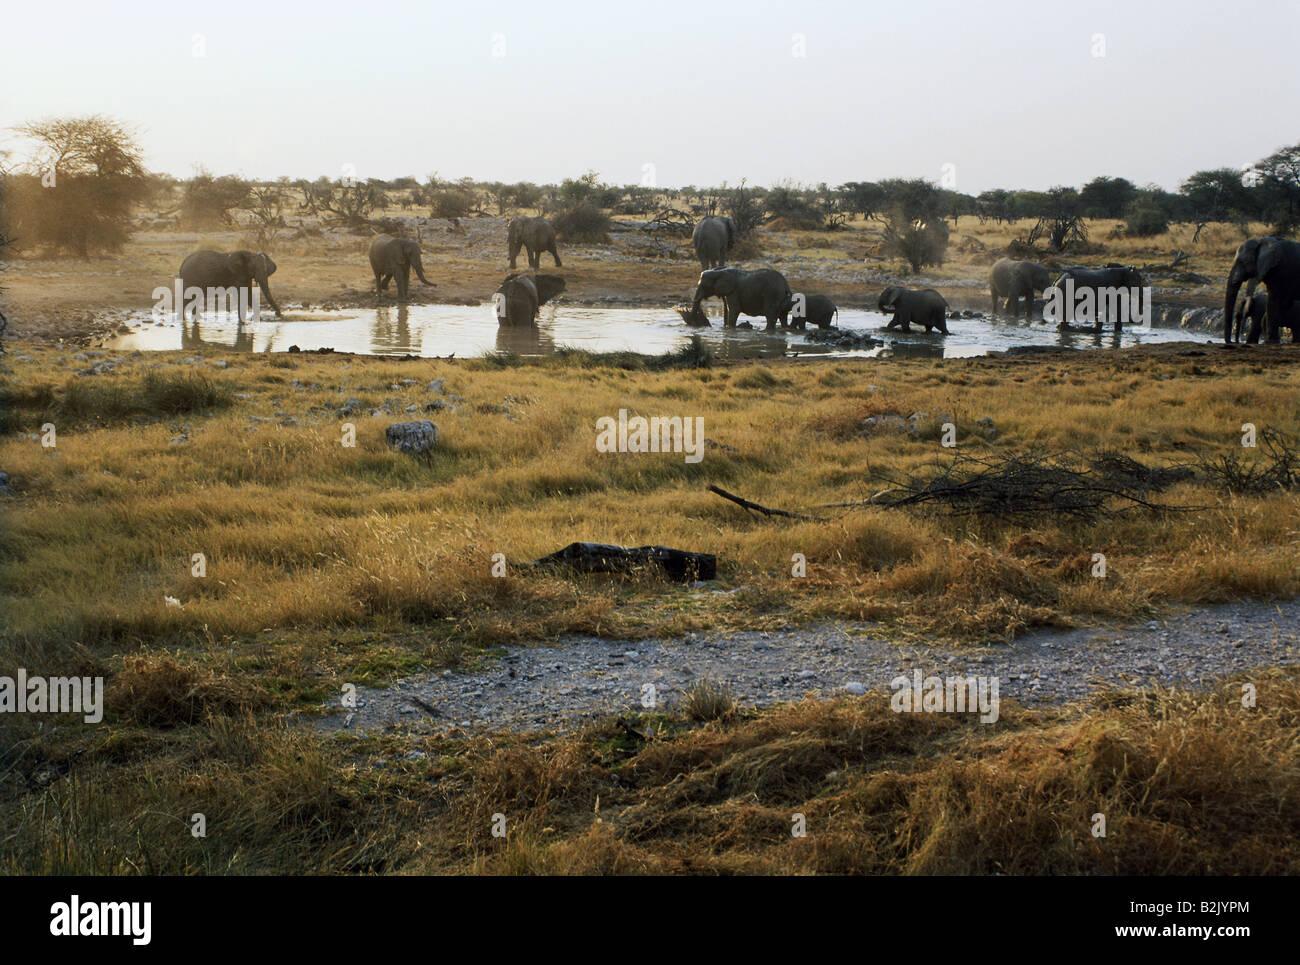 zoology / animals, mammal / mammalian, Elephantidae, African Bush Elephant (Loxodonta africana), herd with cubs - Stock Image